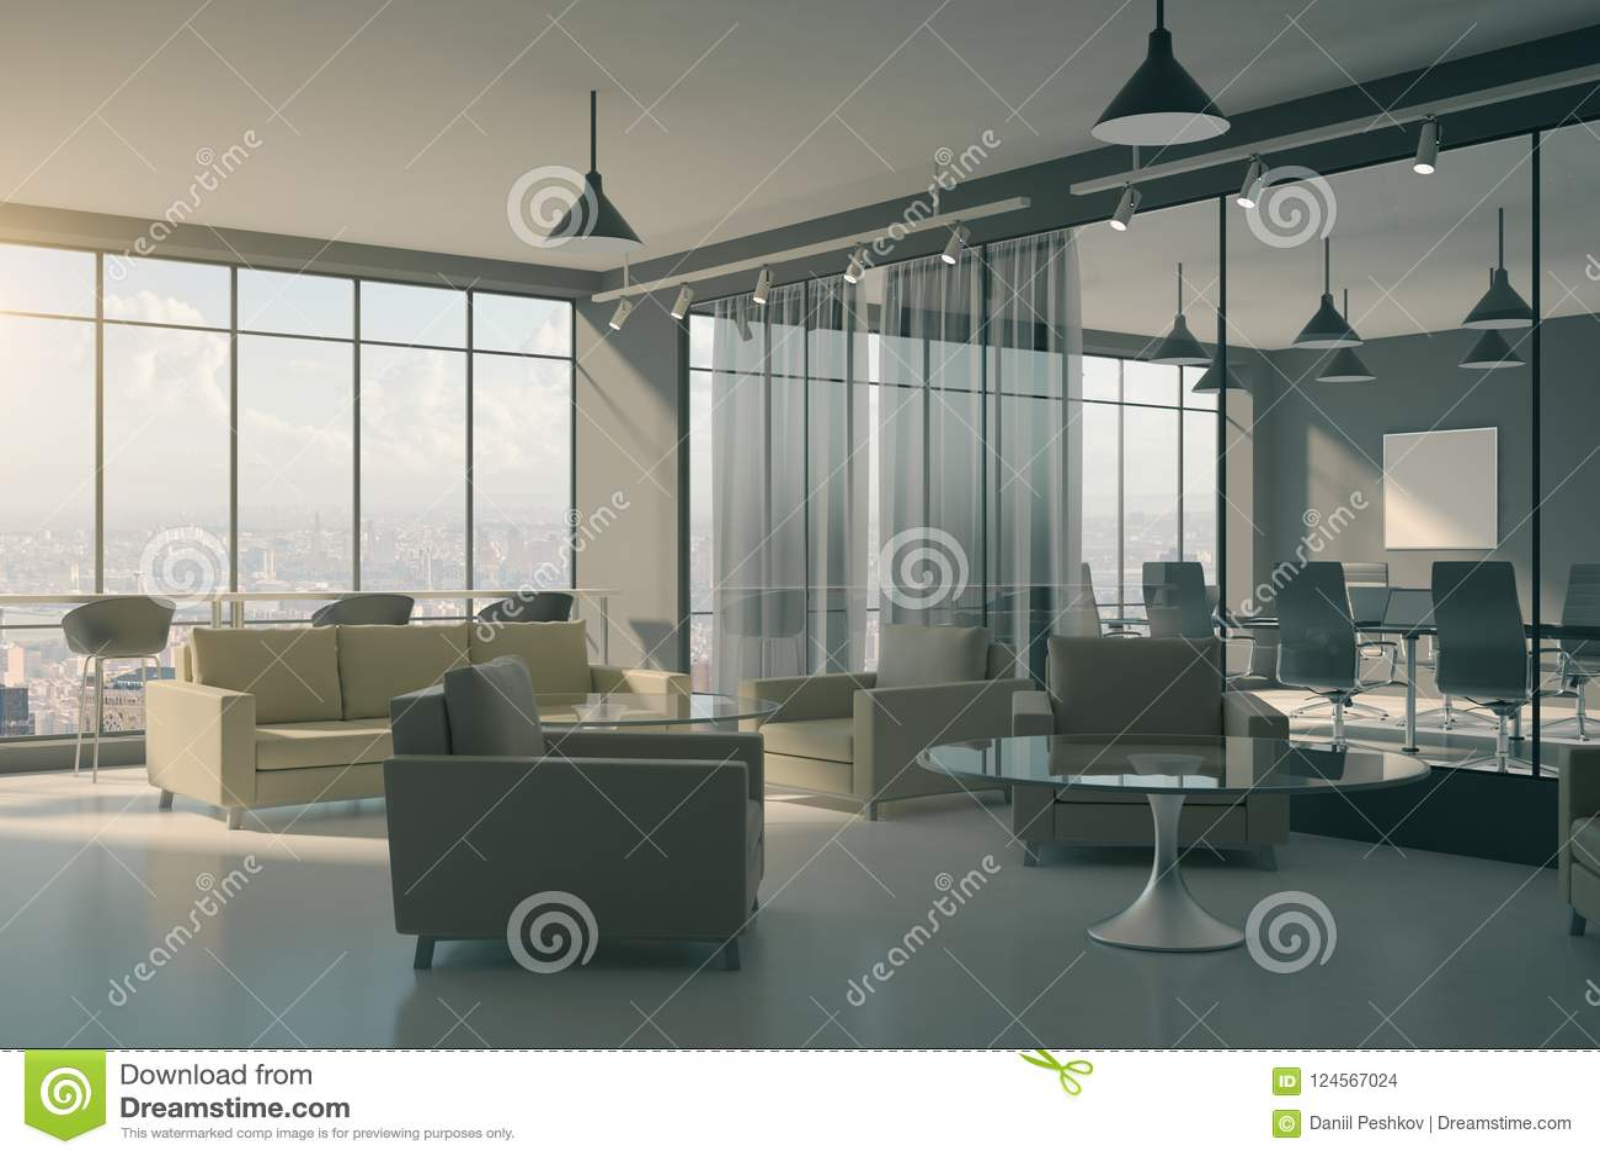 office lobby designs pinterest contemporary office lobby interior office lobby interior stock illustration